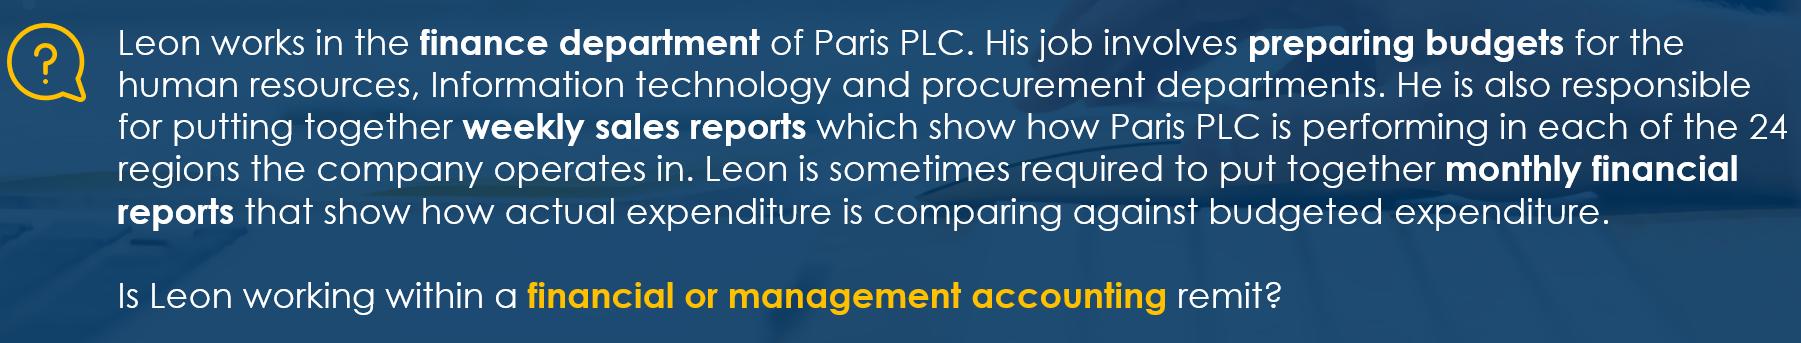 example management accounting v financial accounting